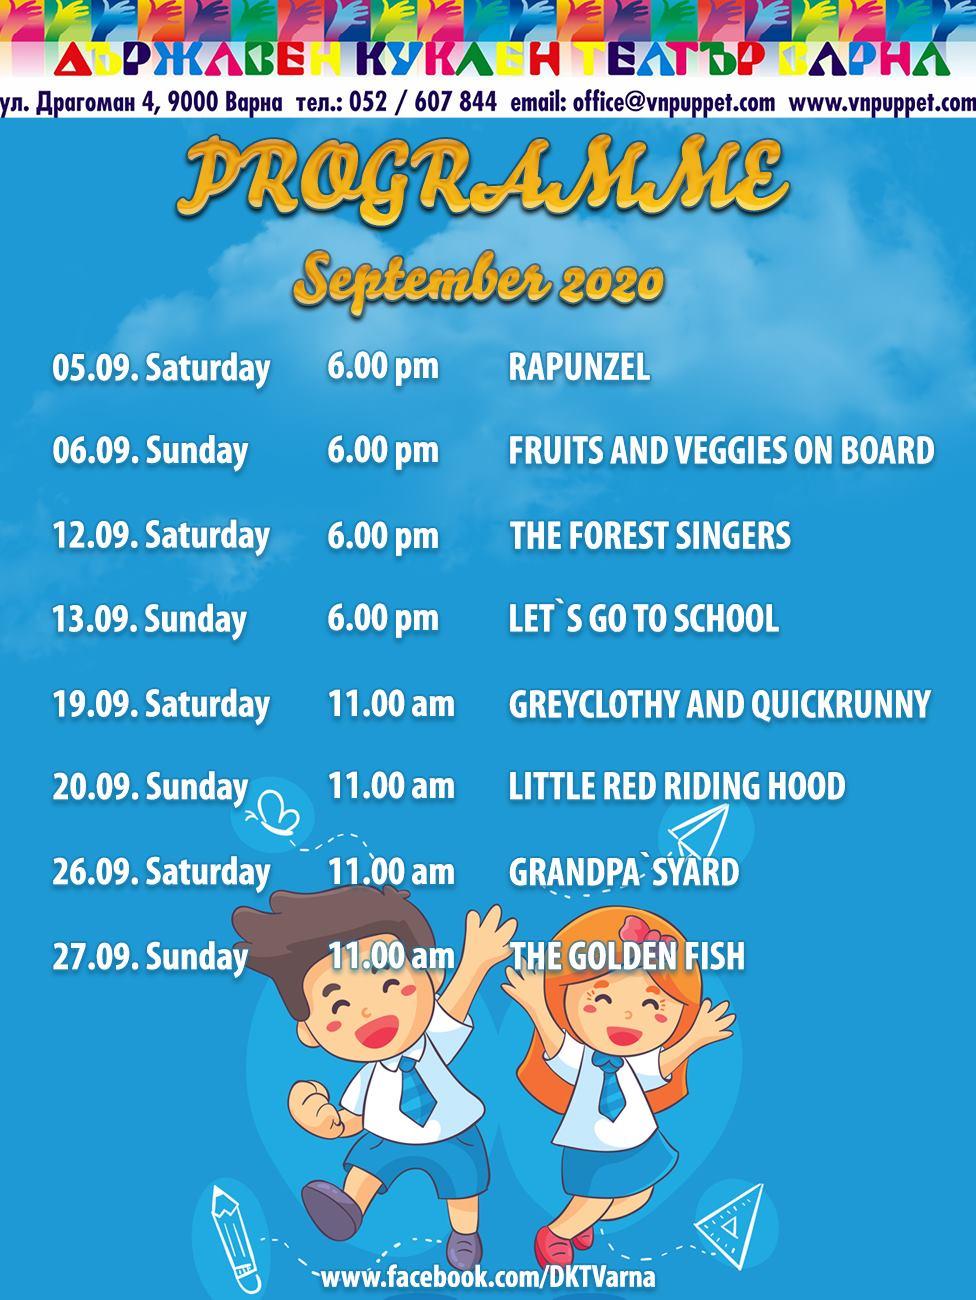 Programme Sept 2020